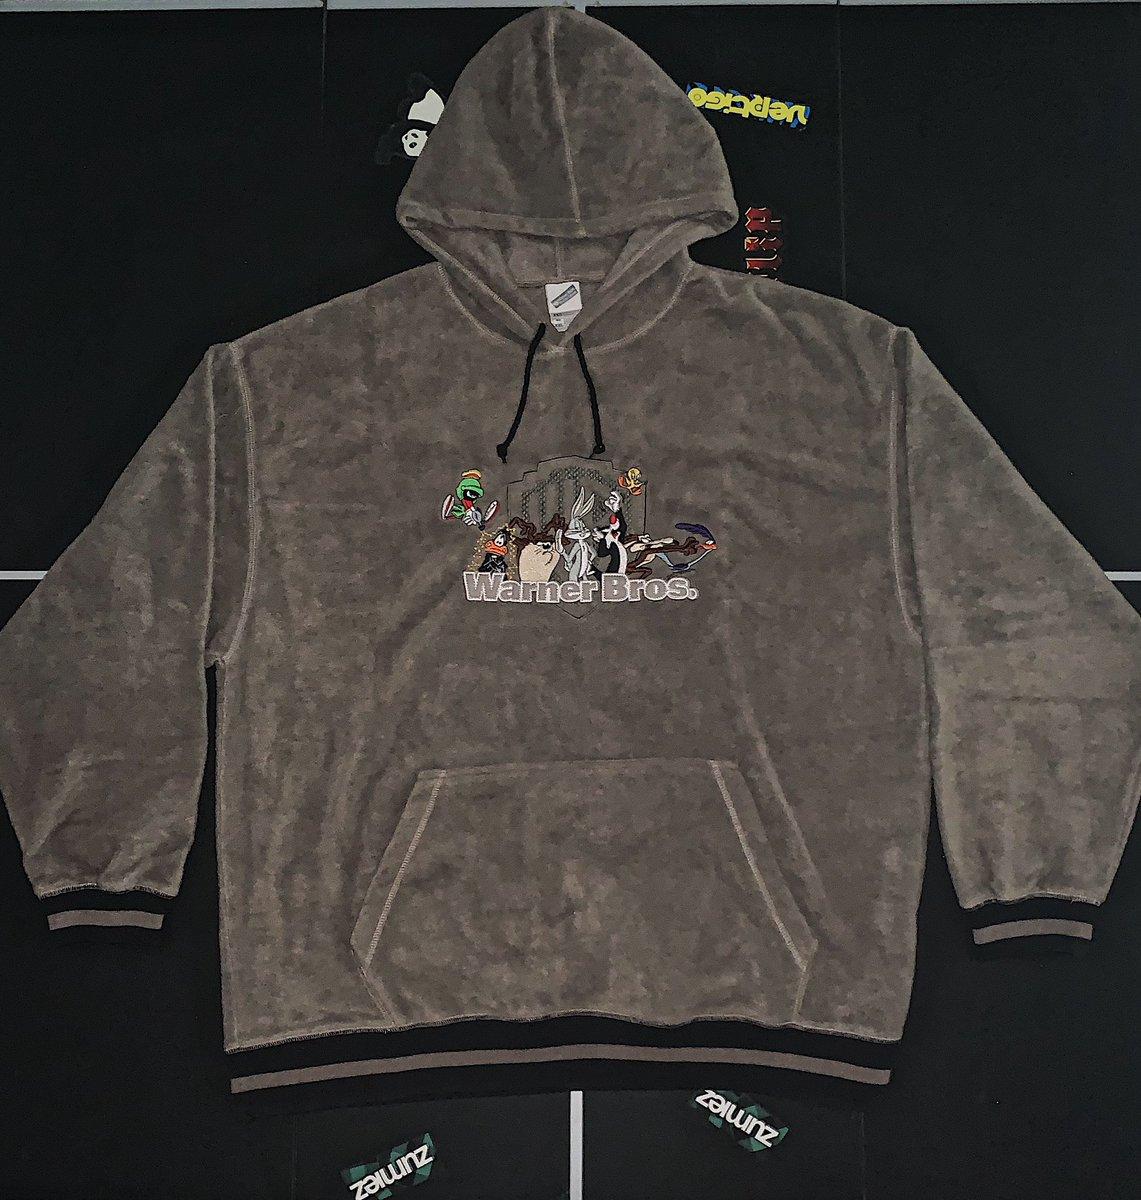 09c5537720f Color: Grey, Black —— Size: XXL —— Condition: Excellent —— Price: $40  http://depop.com/thrift_r_us/ pic.twitter.com/N33DgE6F8C